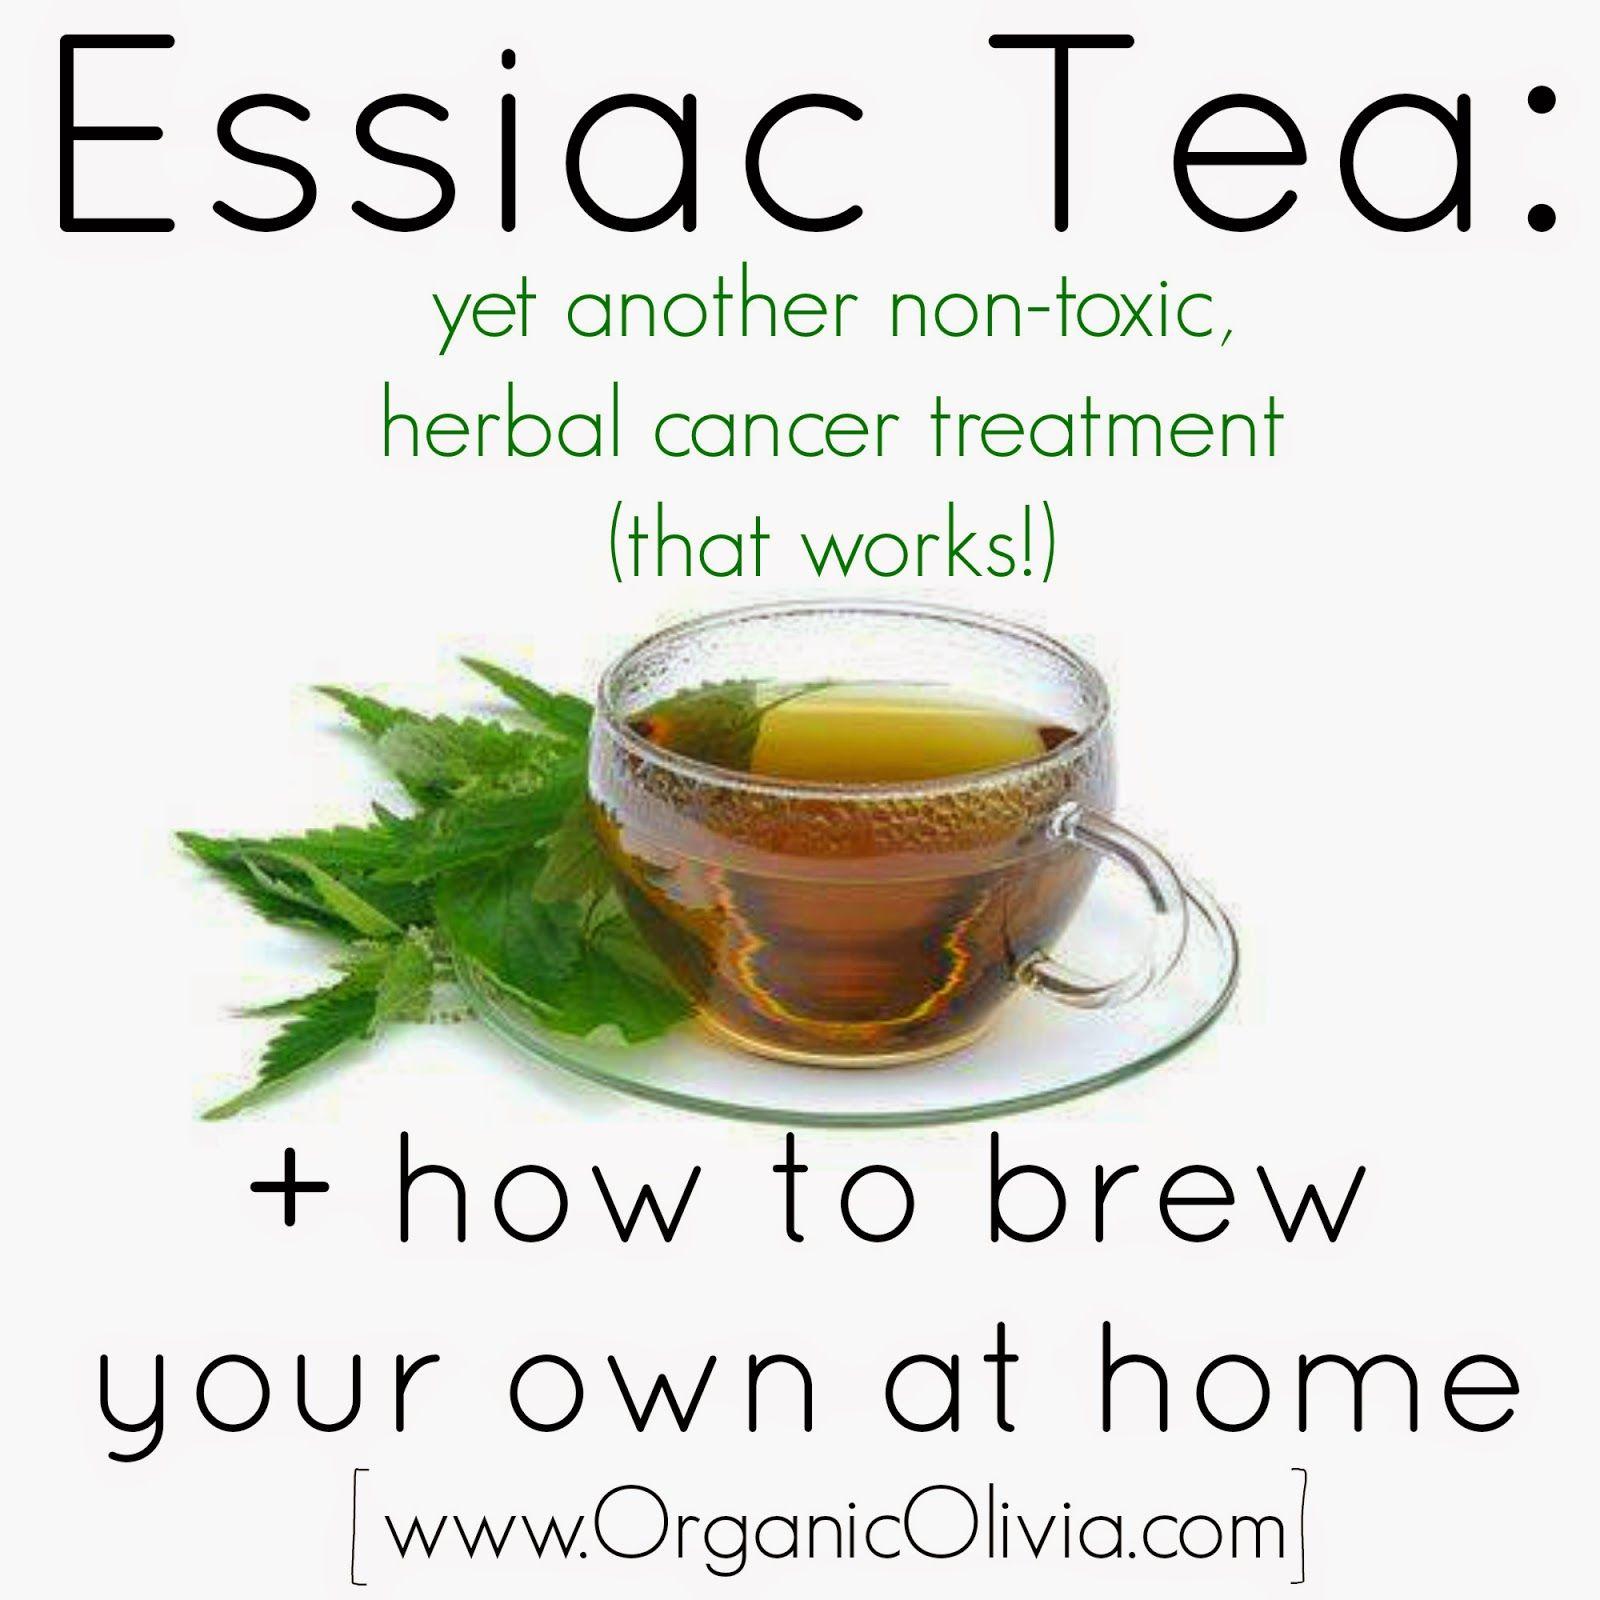 Cancer cure essiac herbal tea - Yet Another Herbal Cancer Treatment That Works Essiac Tea Organic Olivia